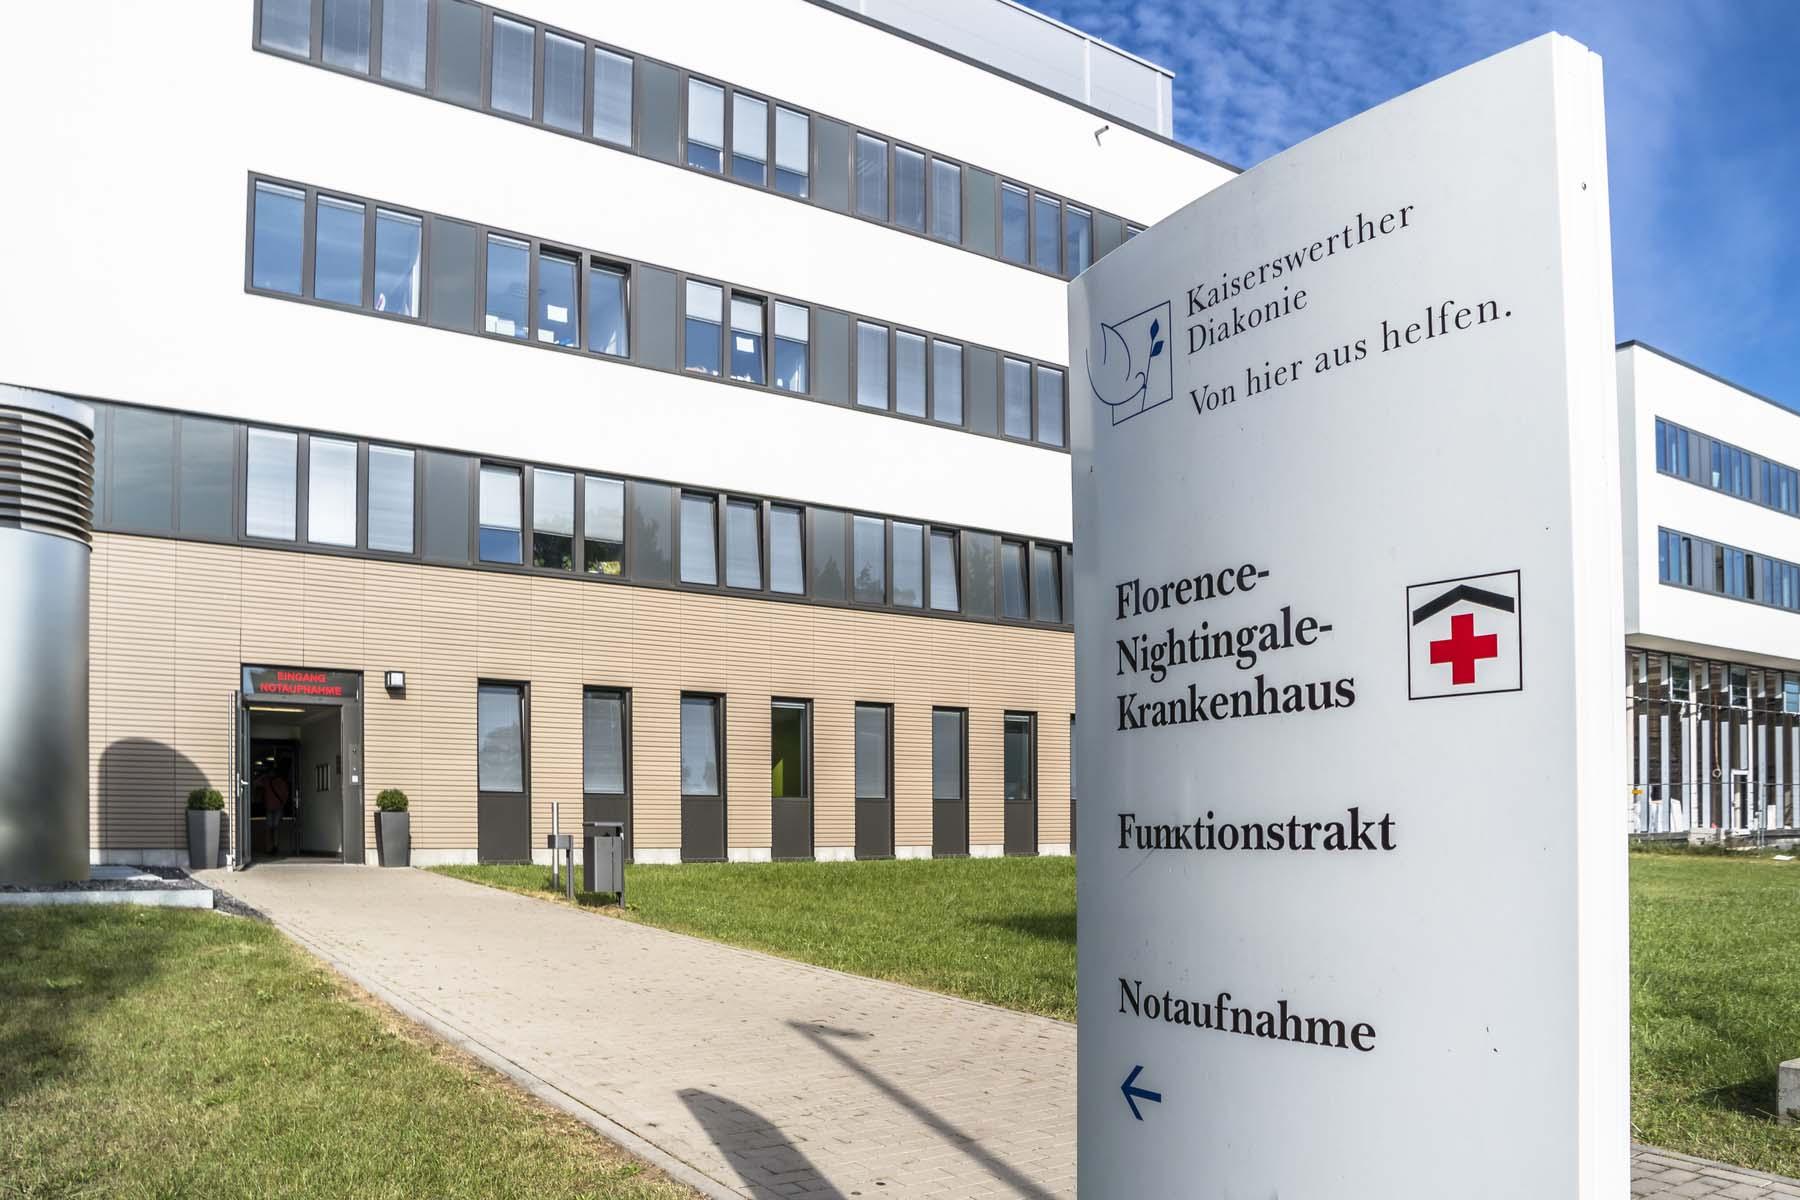 Geramn hospital